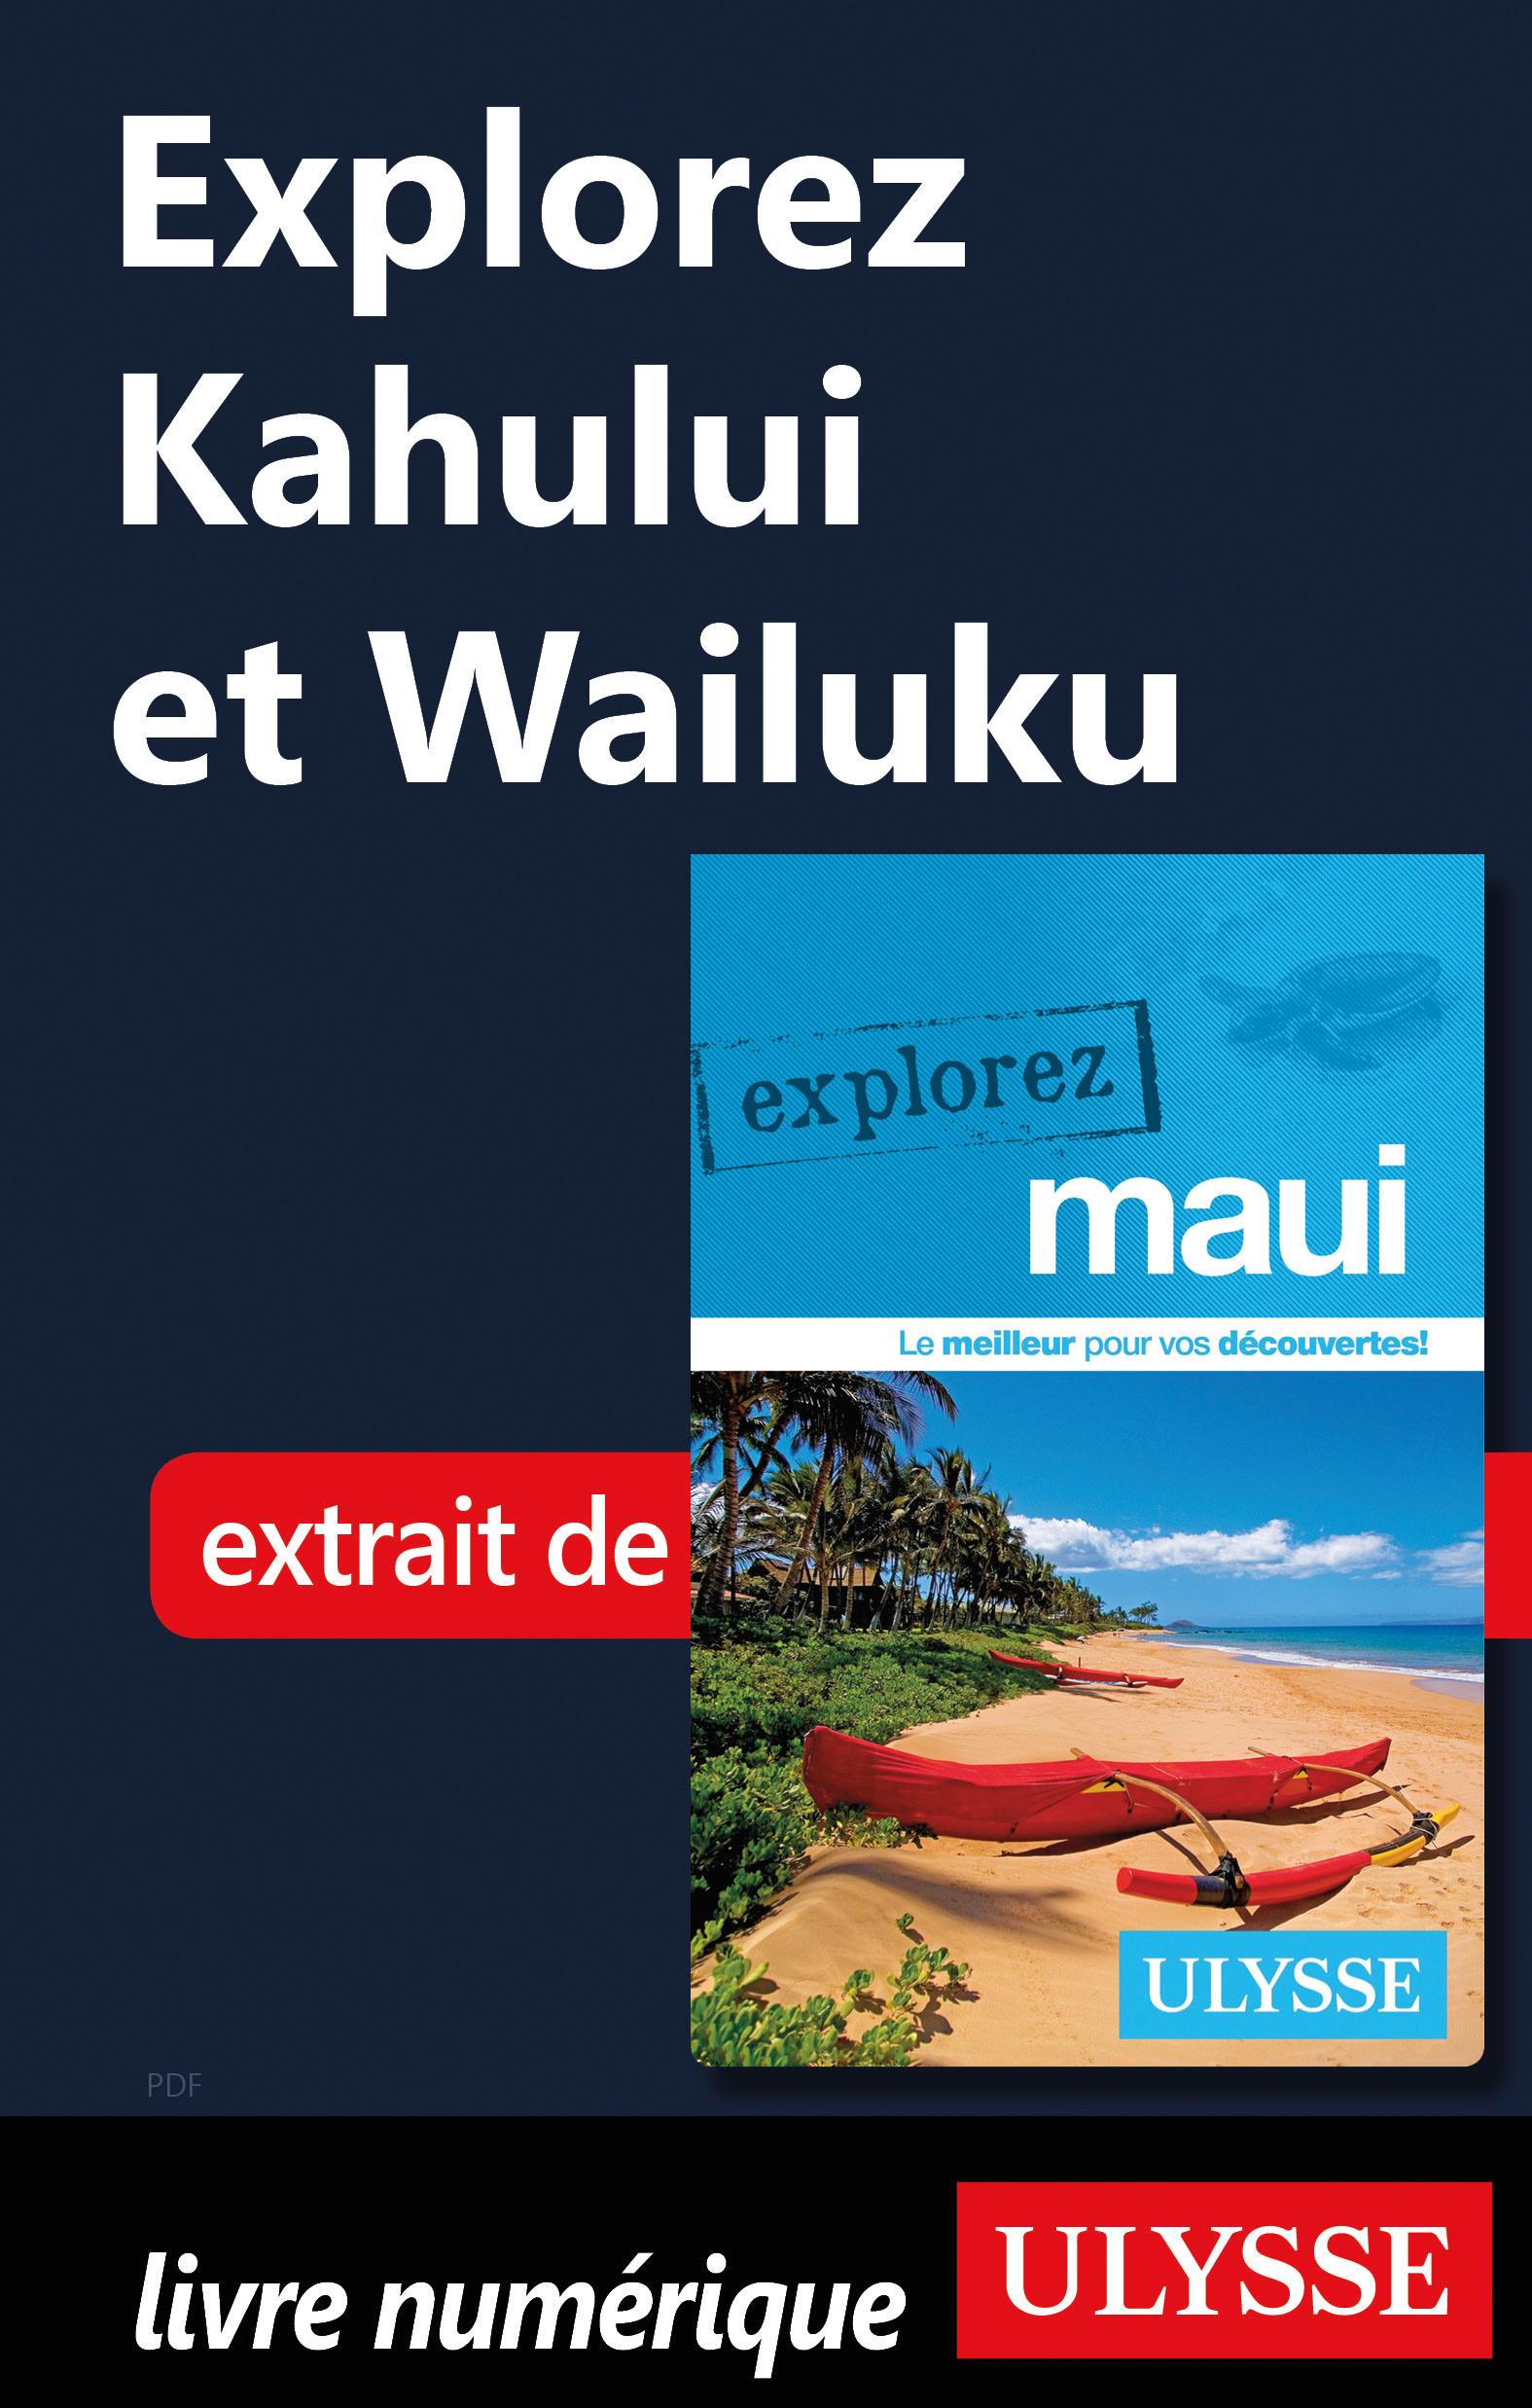 Explorez Kahului et Wailuku